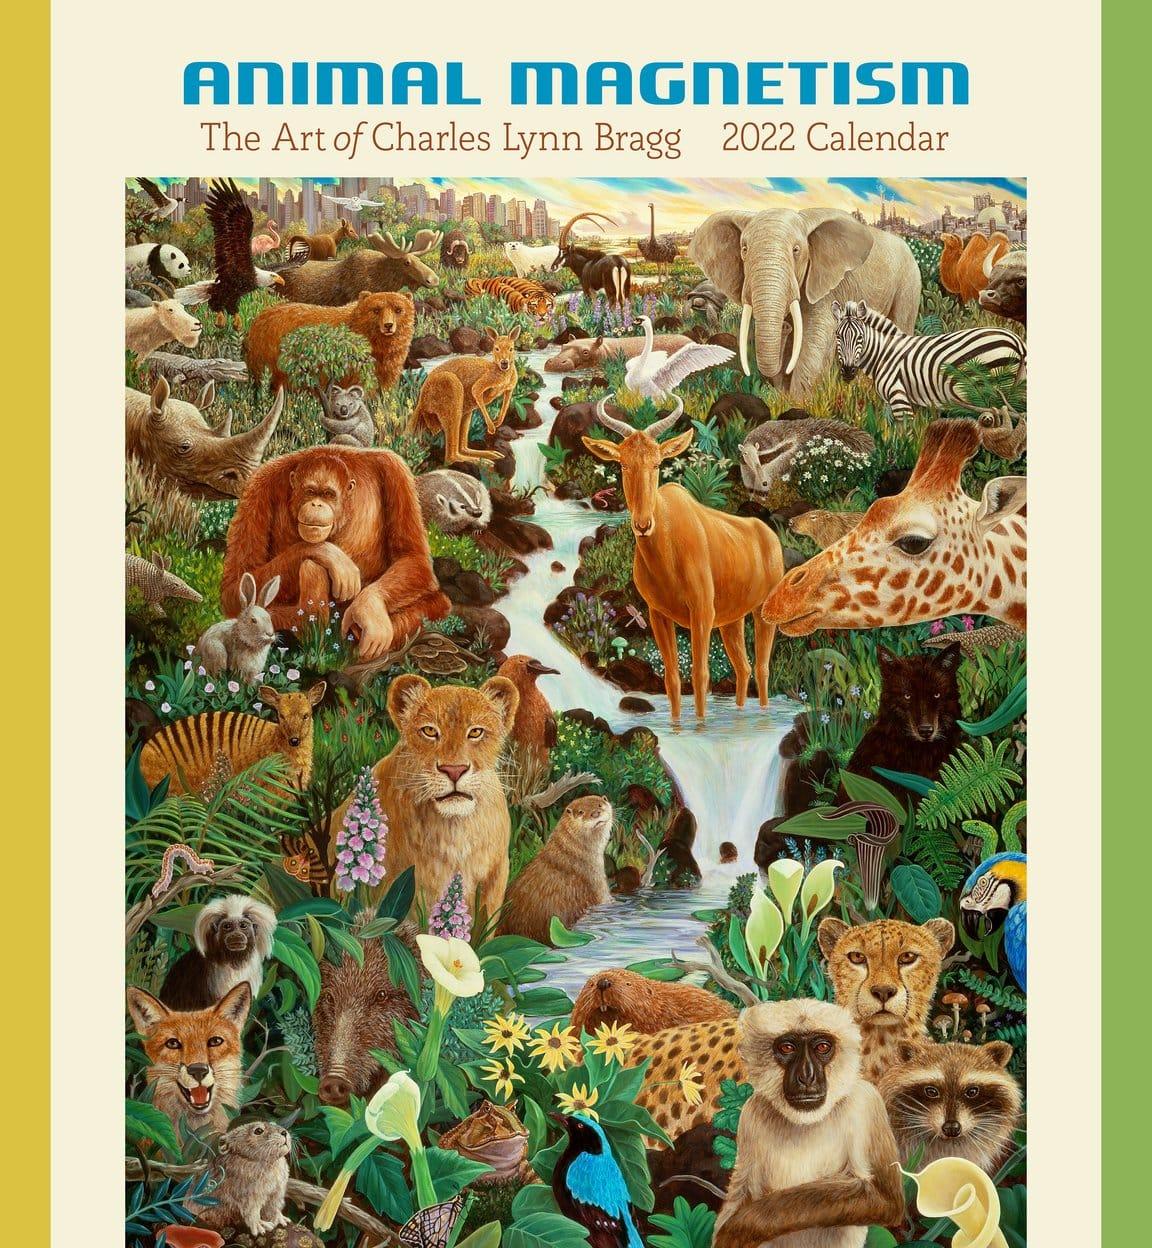 Animal Magnetism 2022 Calendar